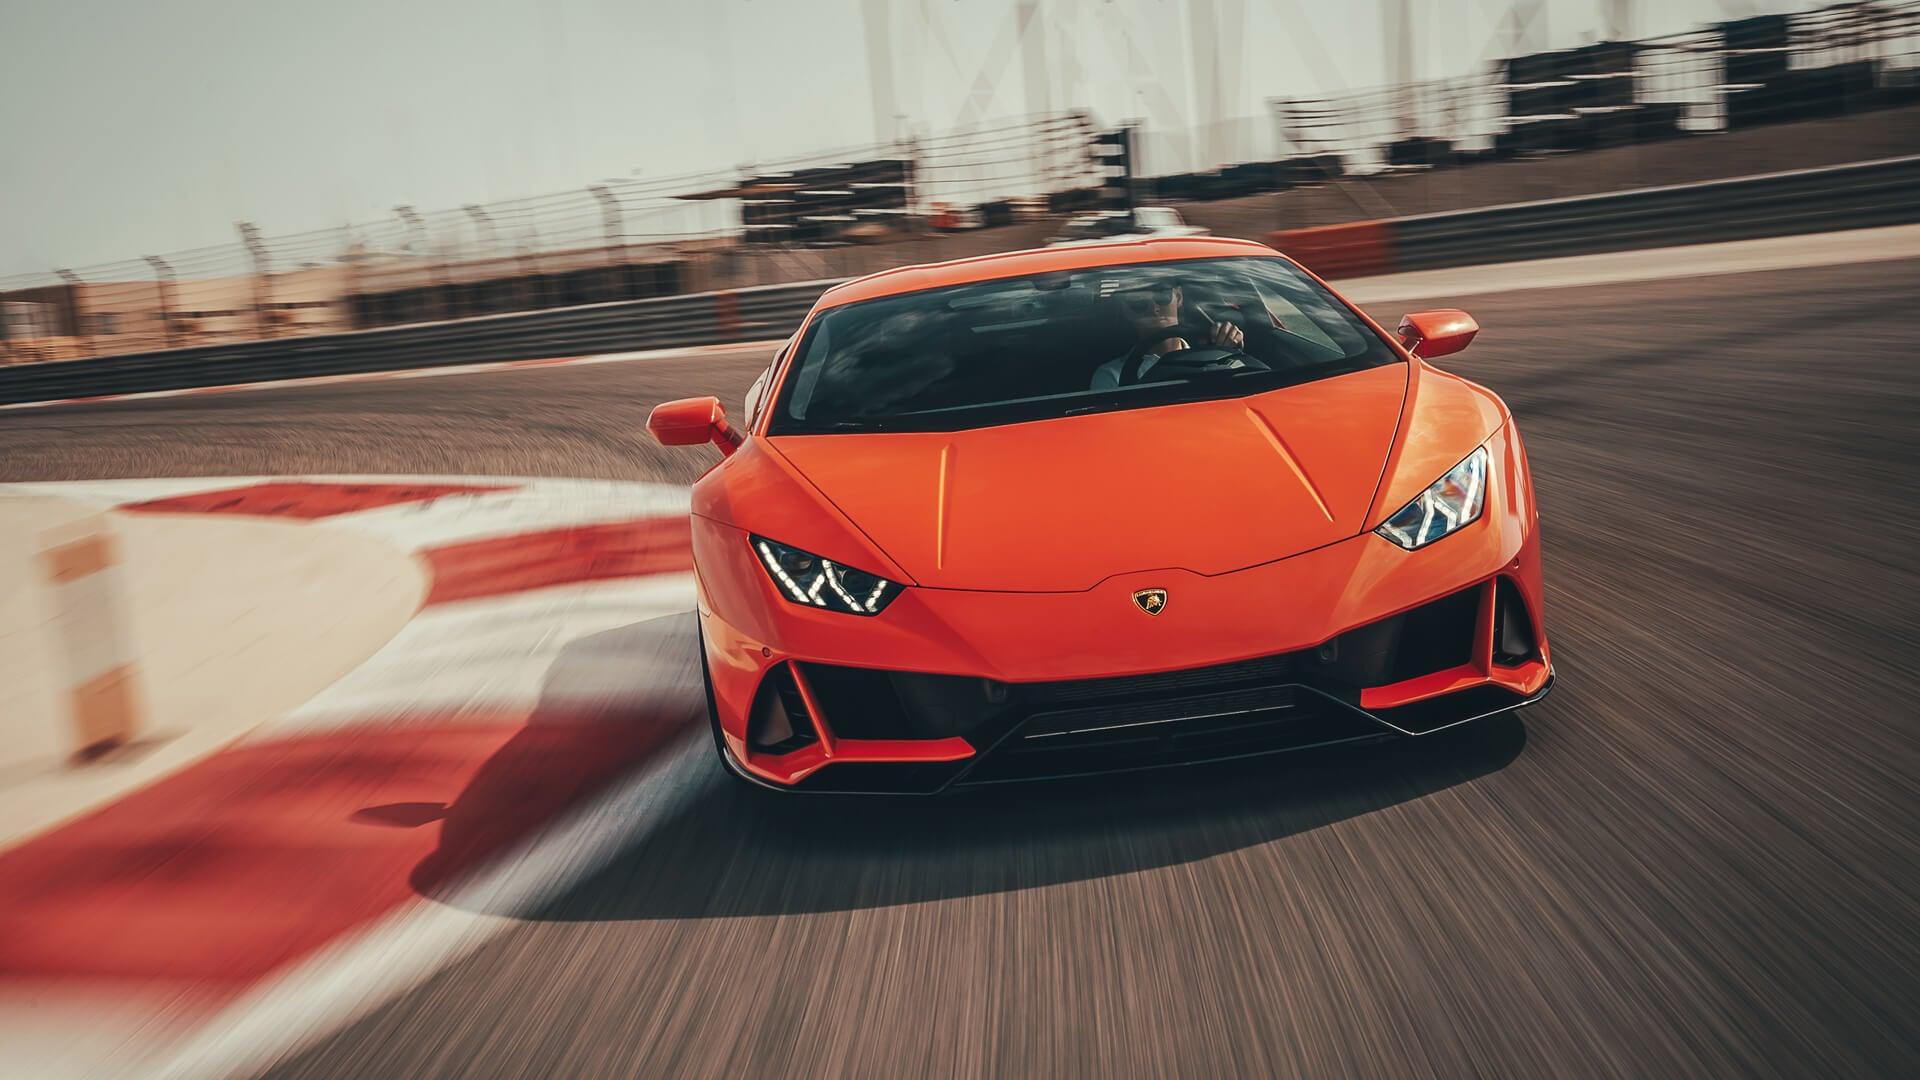 Image result for Lamborghini Huracan EVO